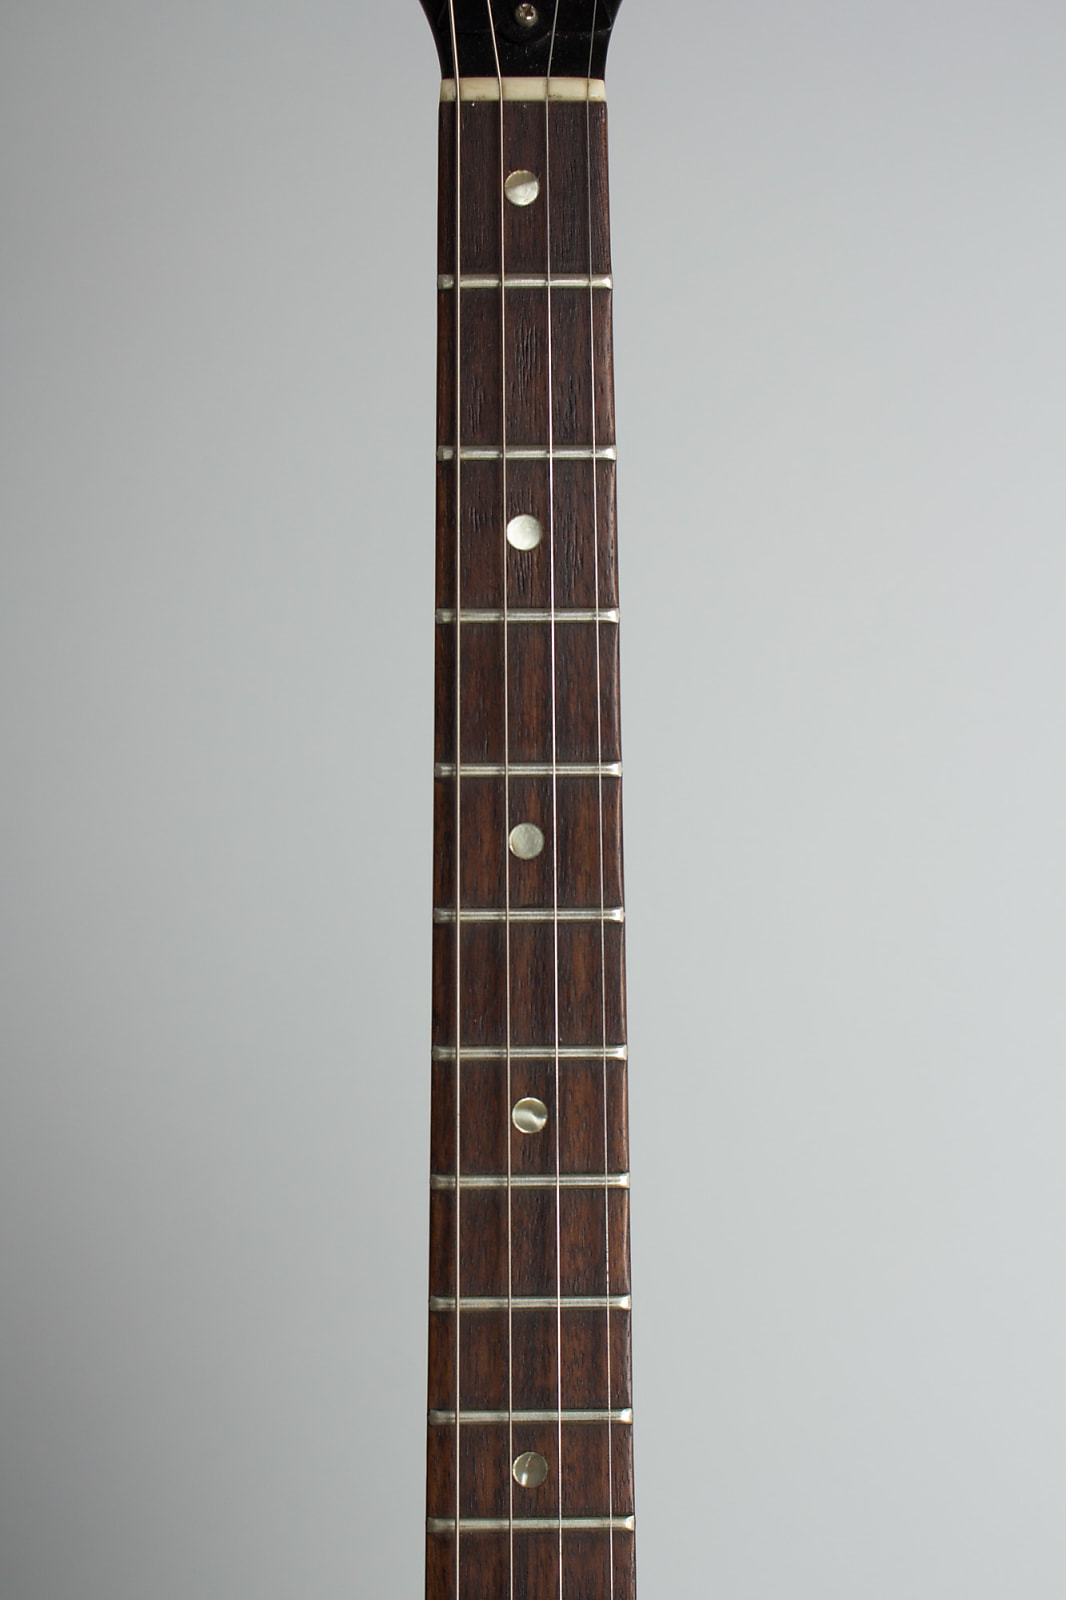 Gibson  TG-25 Flat Top Tenor Guitar (1965), ser. #514570, black hard shell case.